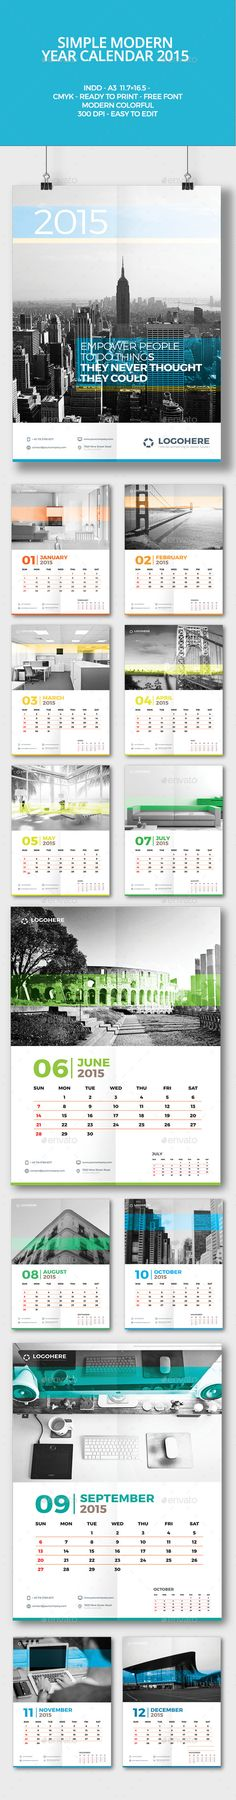 Simple Modern Year Calendar 2015 - Calendars Stationery